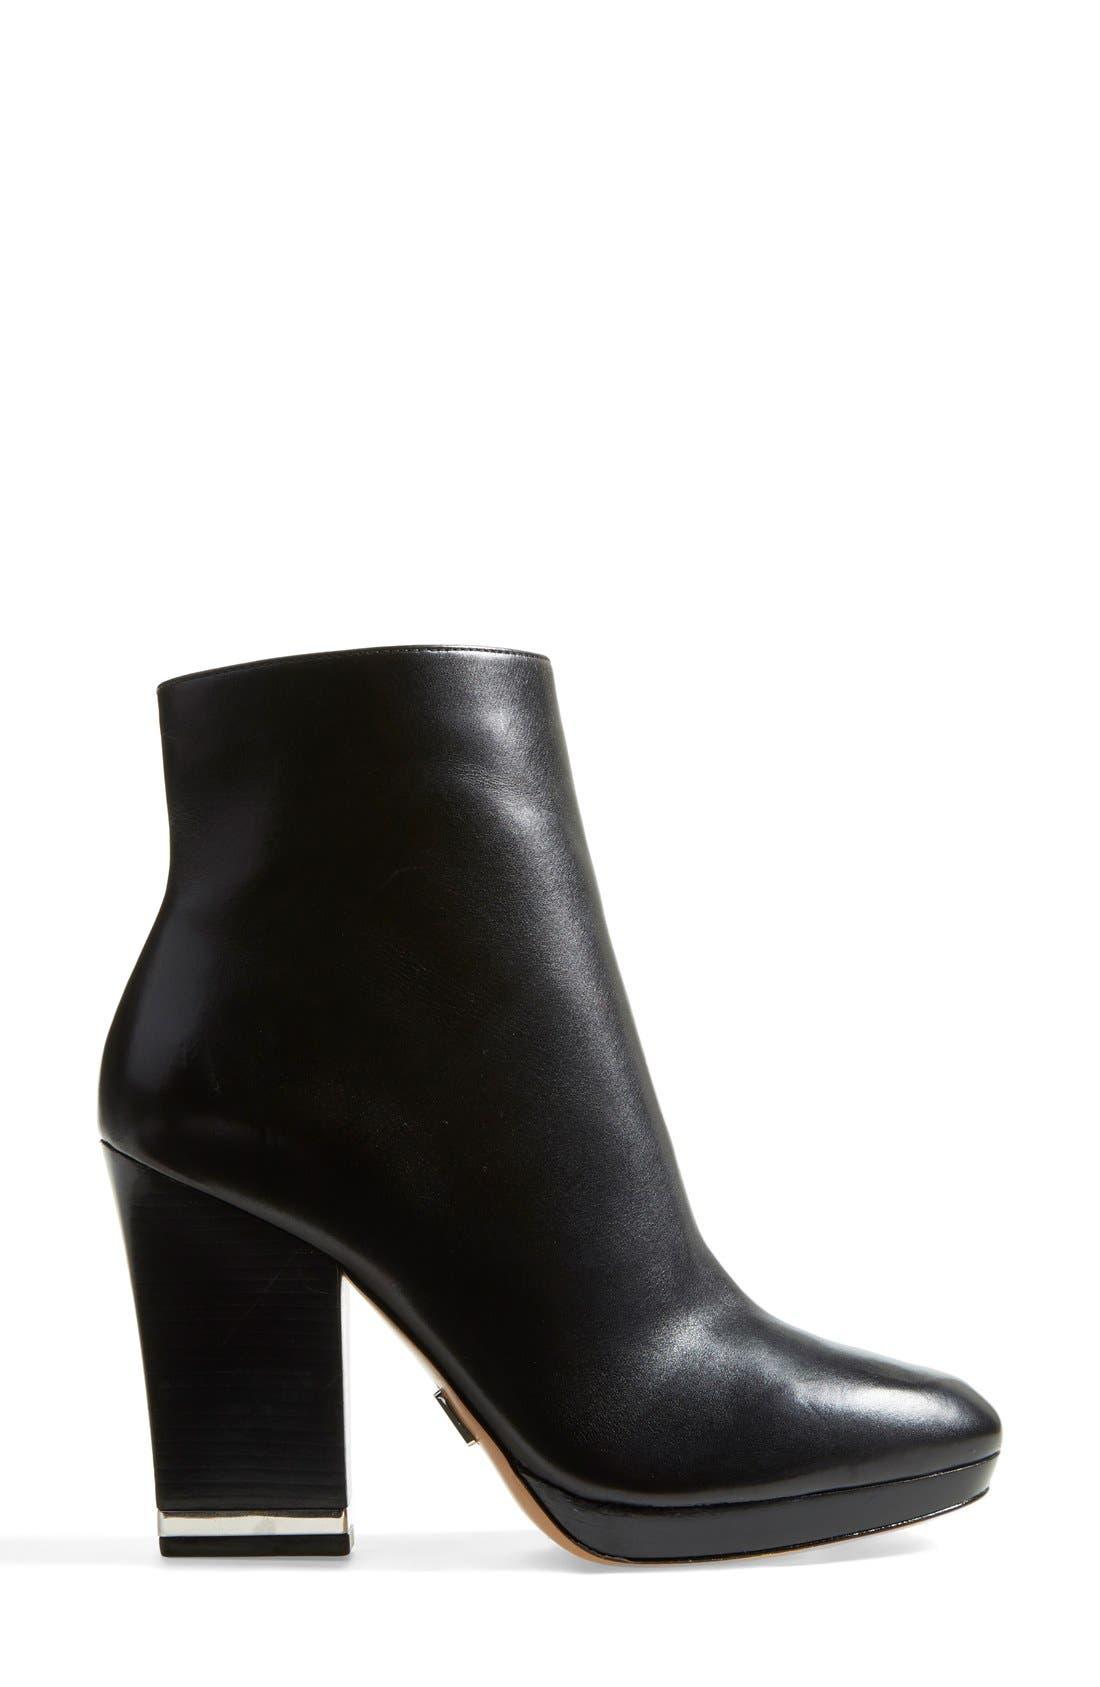 Alternate Image 4  - Michael Kors 'Catherine' Calfskin Leather Almond Toe Bootie (Women)